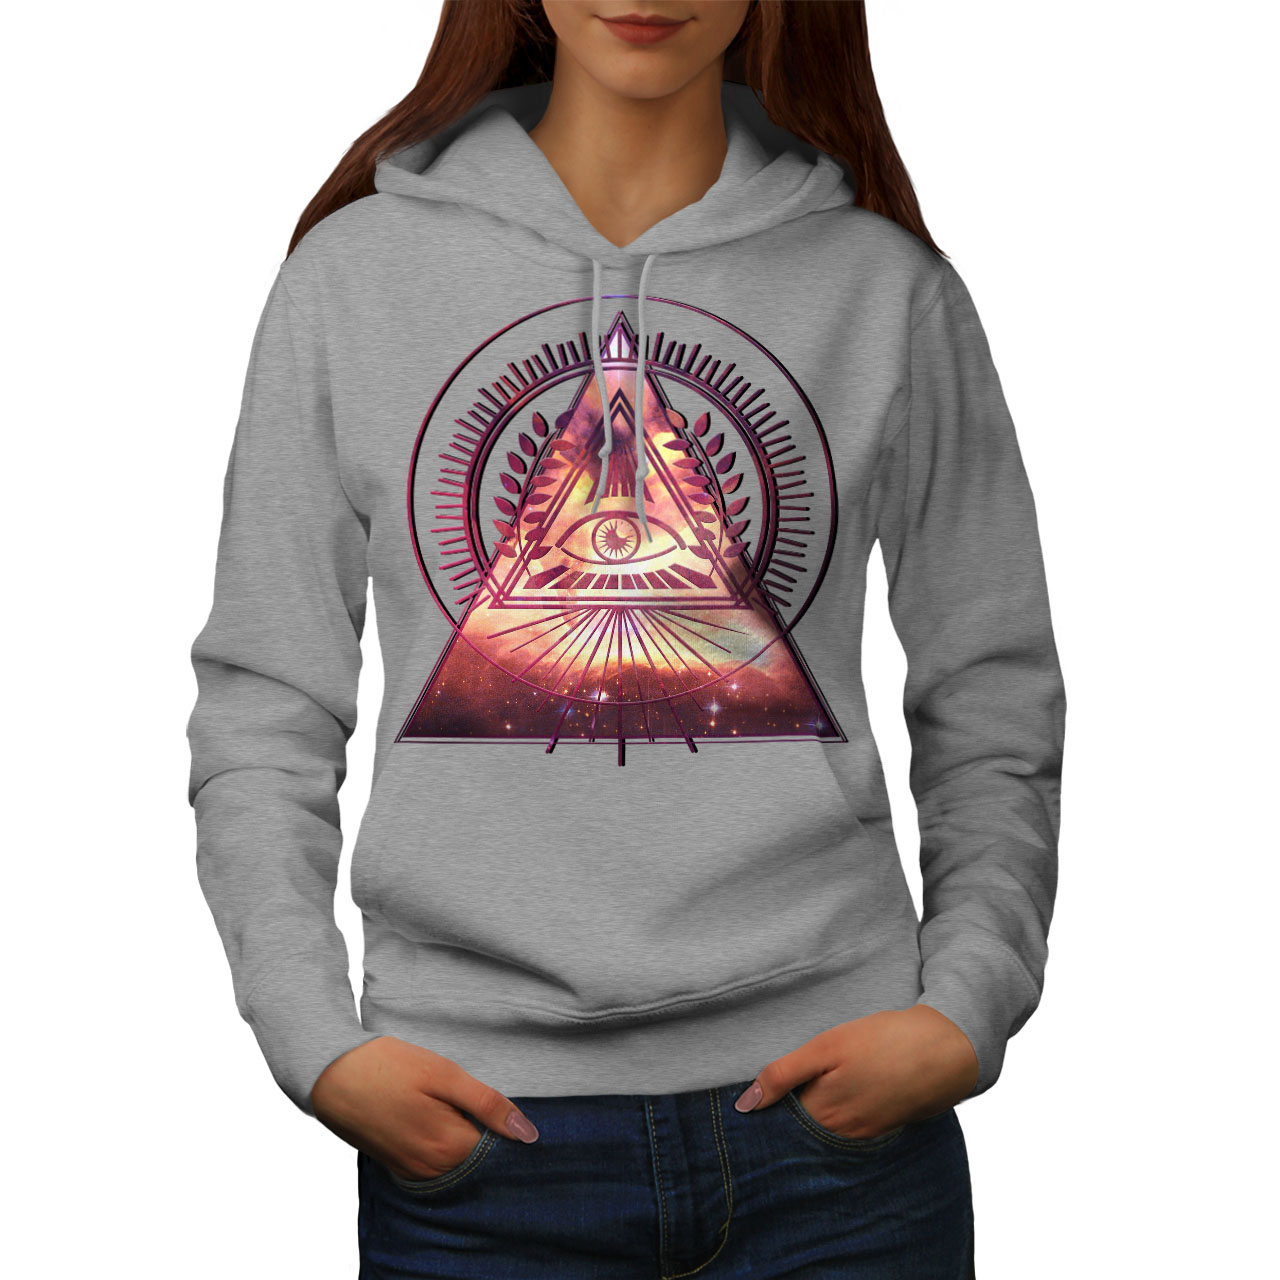 Wellcoda Triangle Galaxy Womens Hoodie Mystic Casual Hooded Sweatshirt